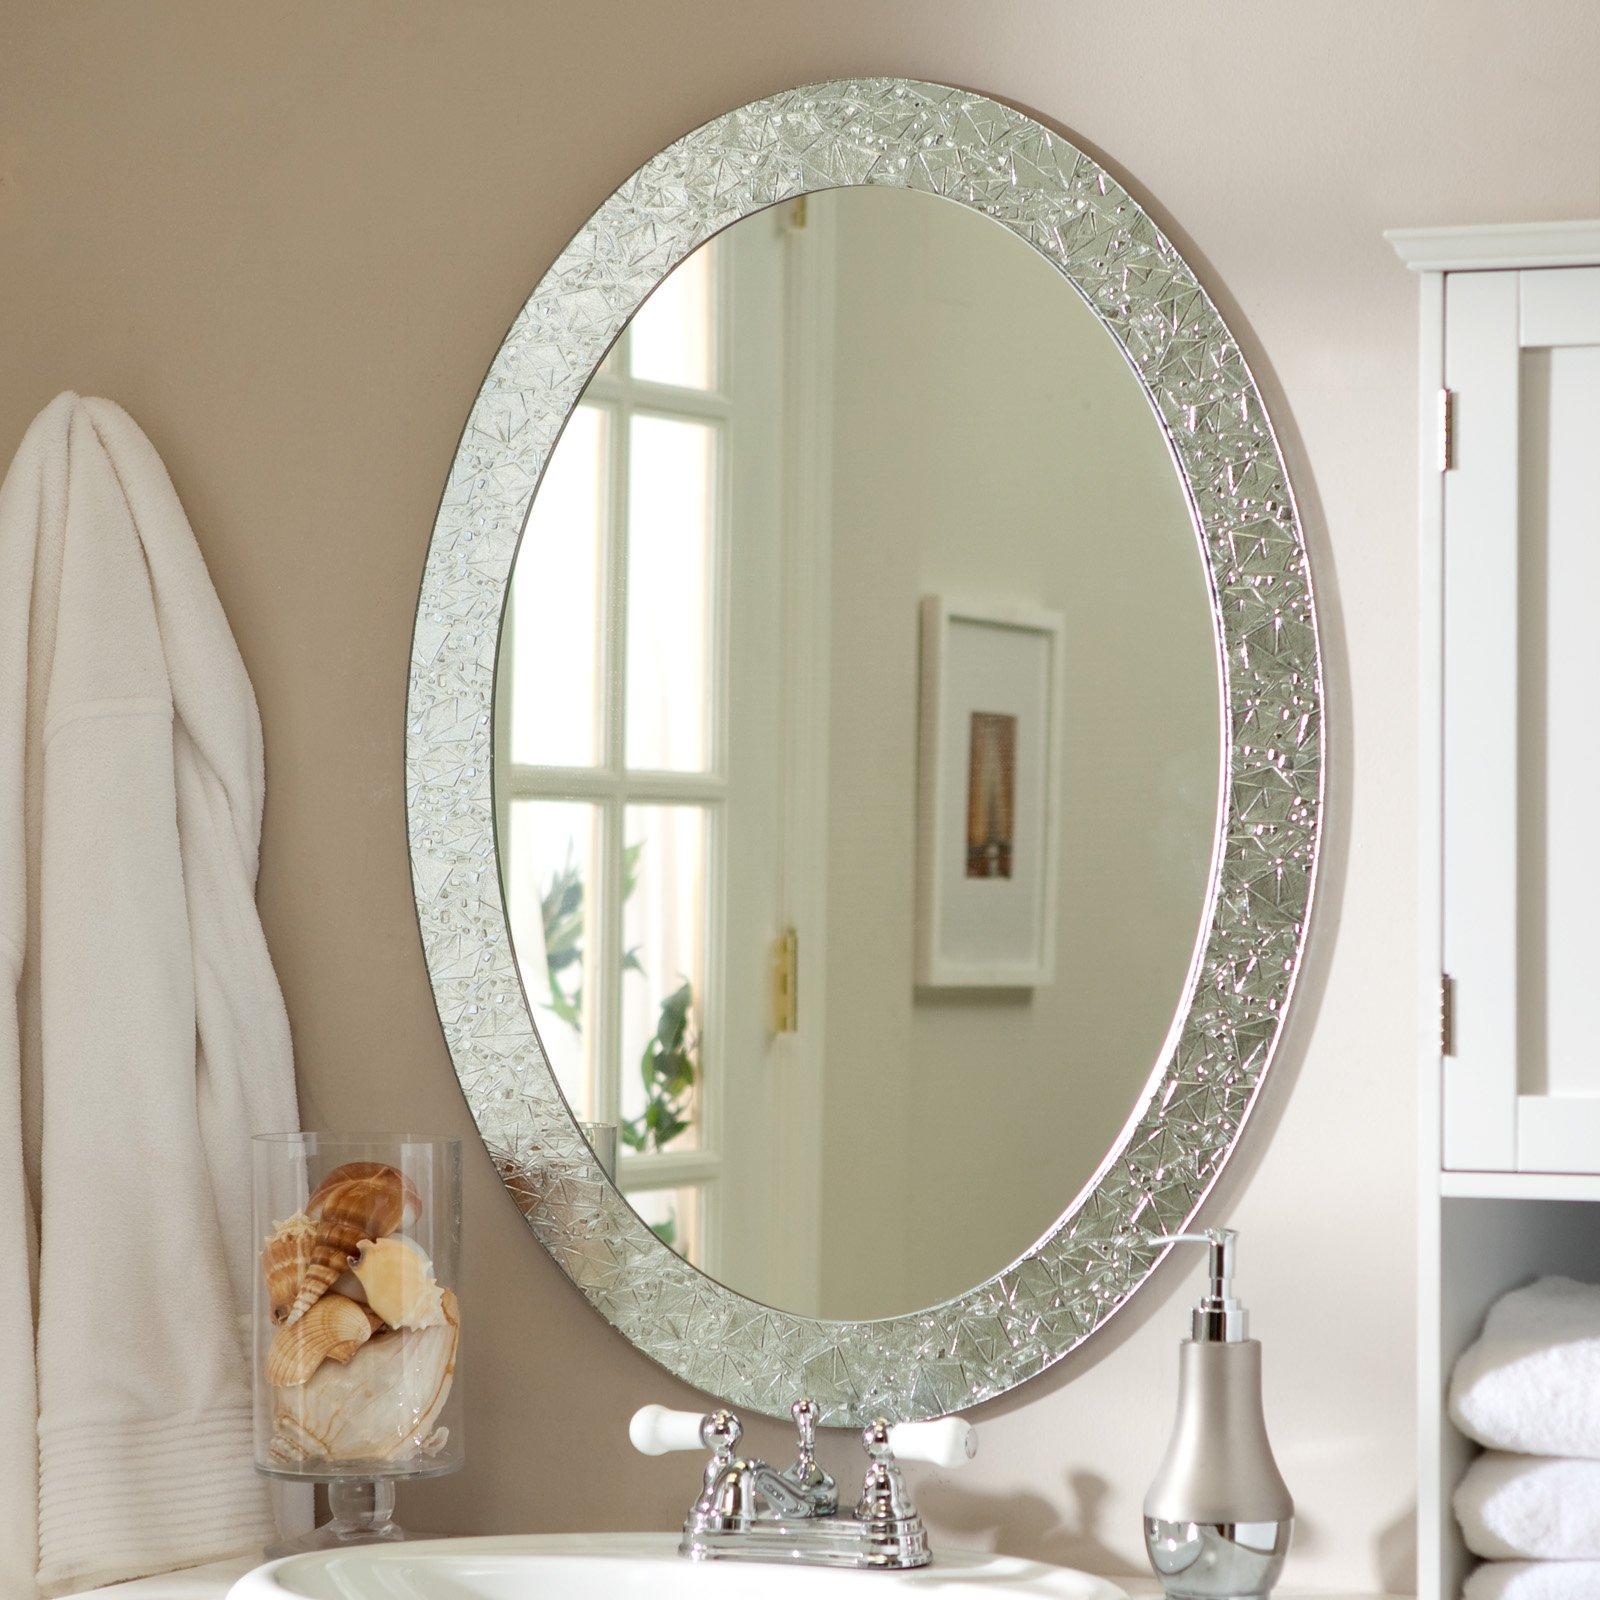 Decor Wonderland Frameless Crystal Try Mirror - 23.5W x 31.5H in.